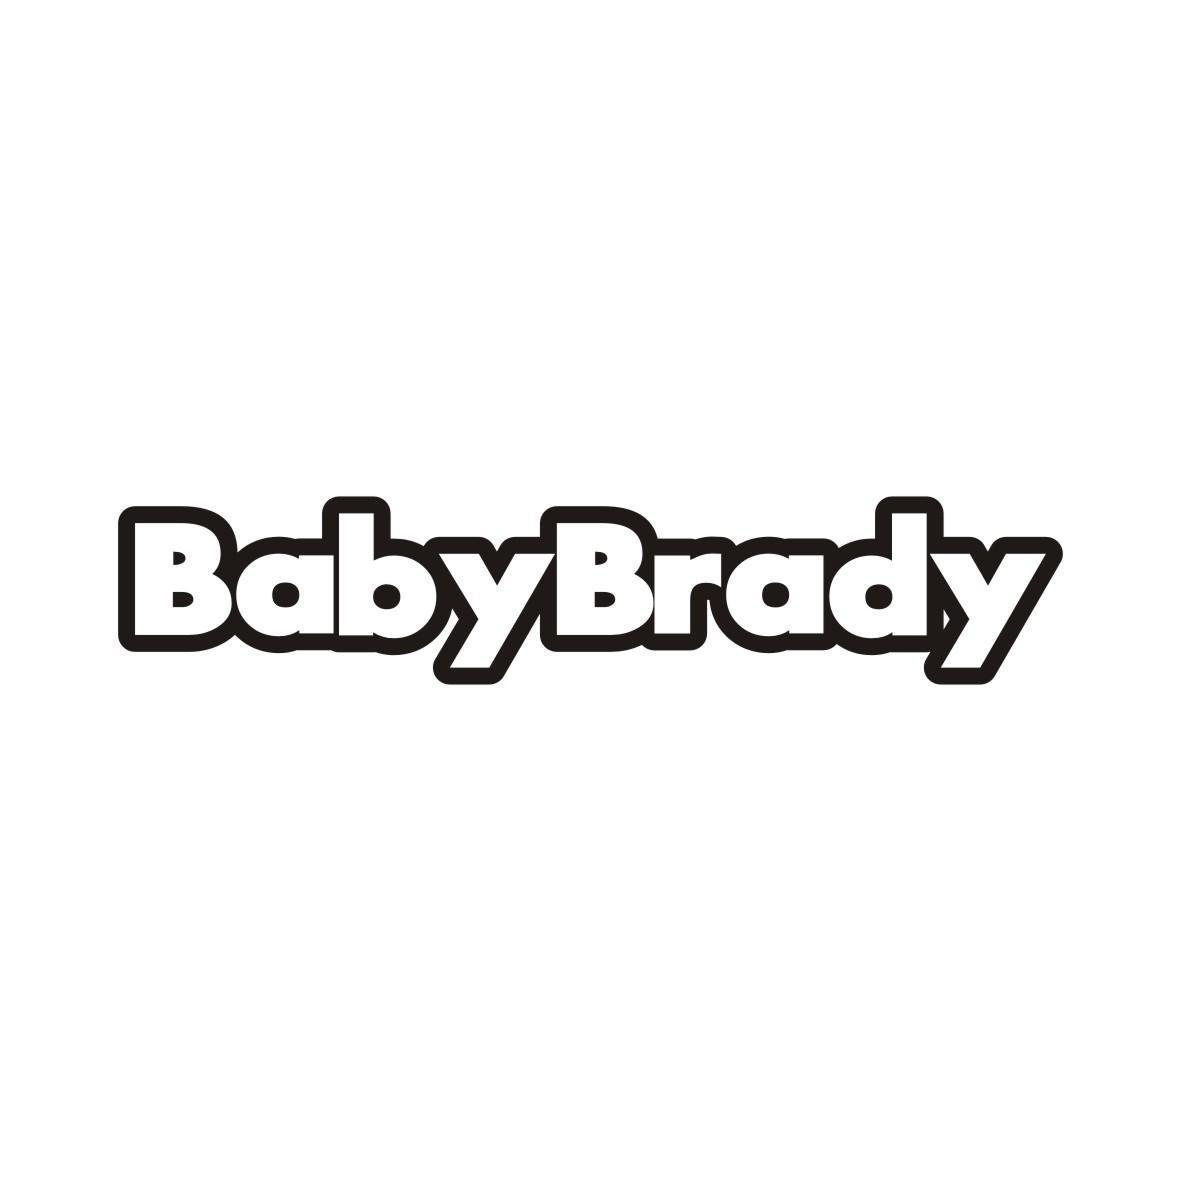 BABYBRADY